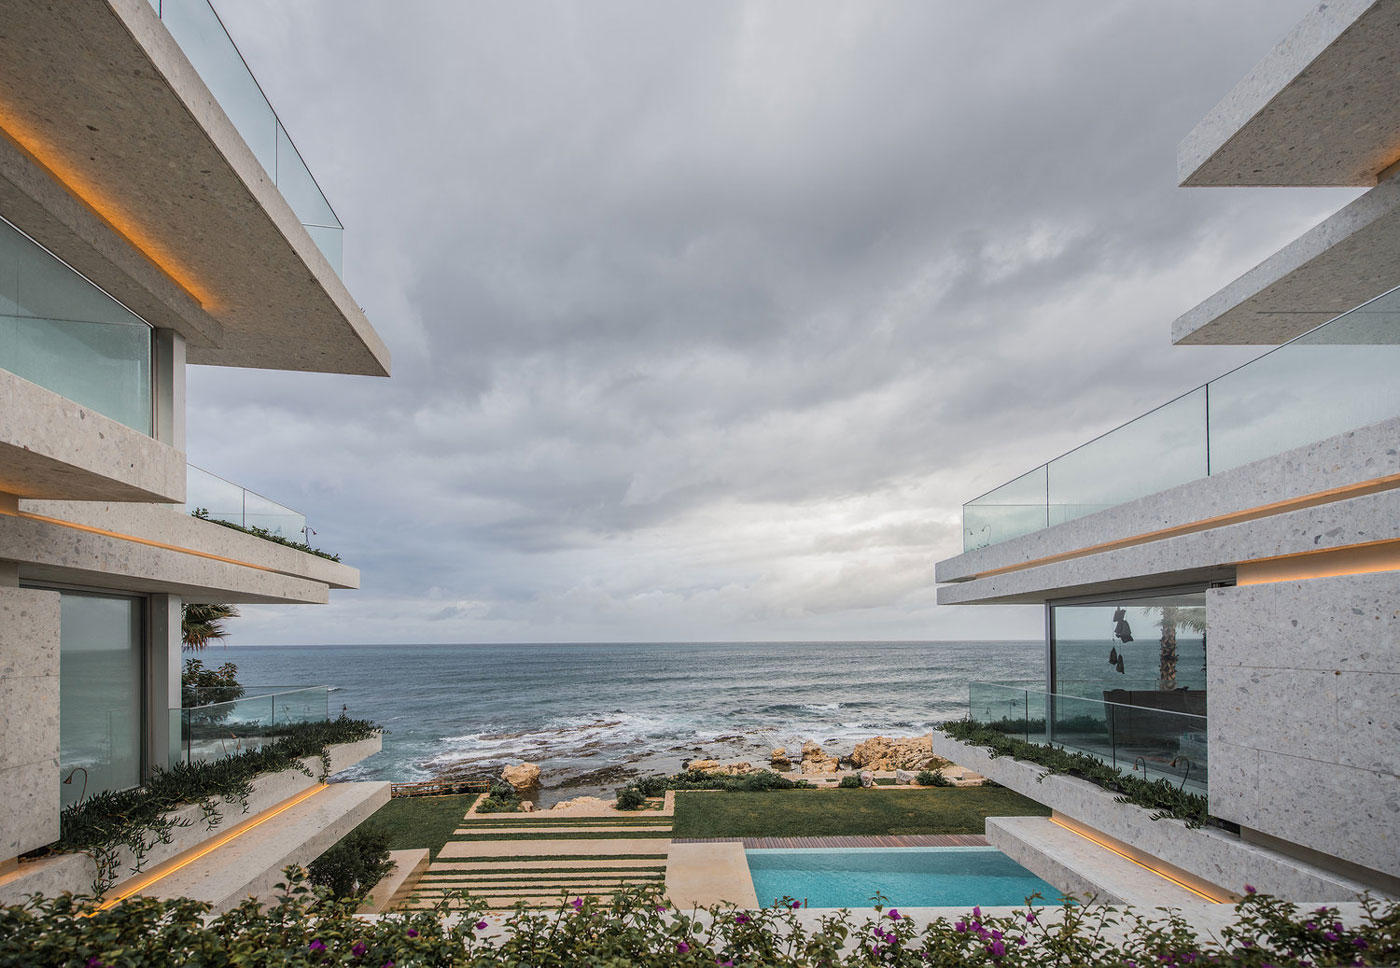 Pool, beach & sea